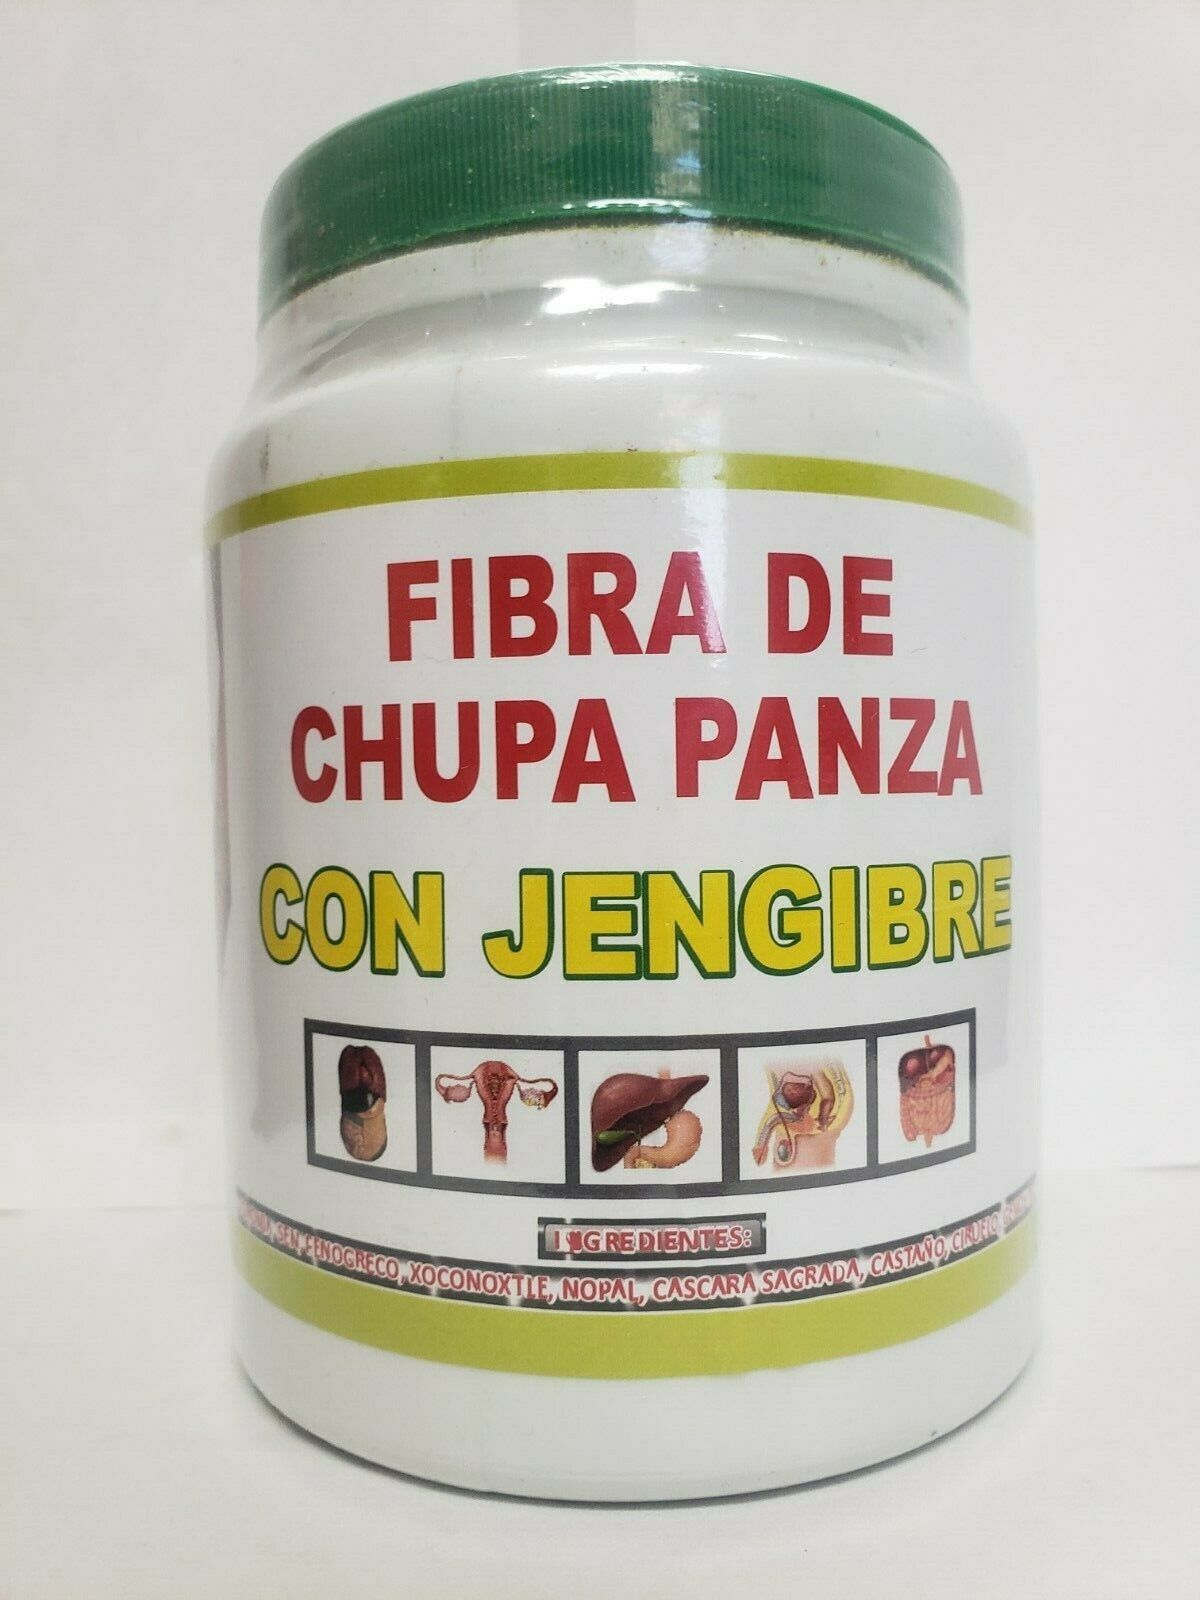 BIG SIZE fibra CHUPA PANZA + JENGIBRE + BAMITOL + QUEMADOR D GRASA WEIGHT LOSS